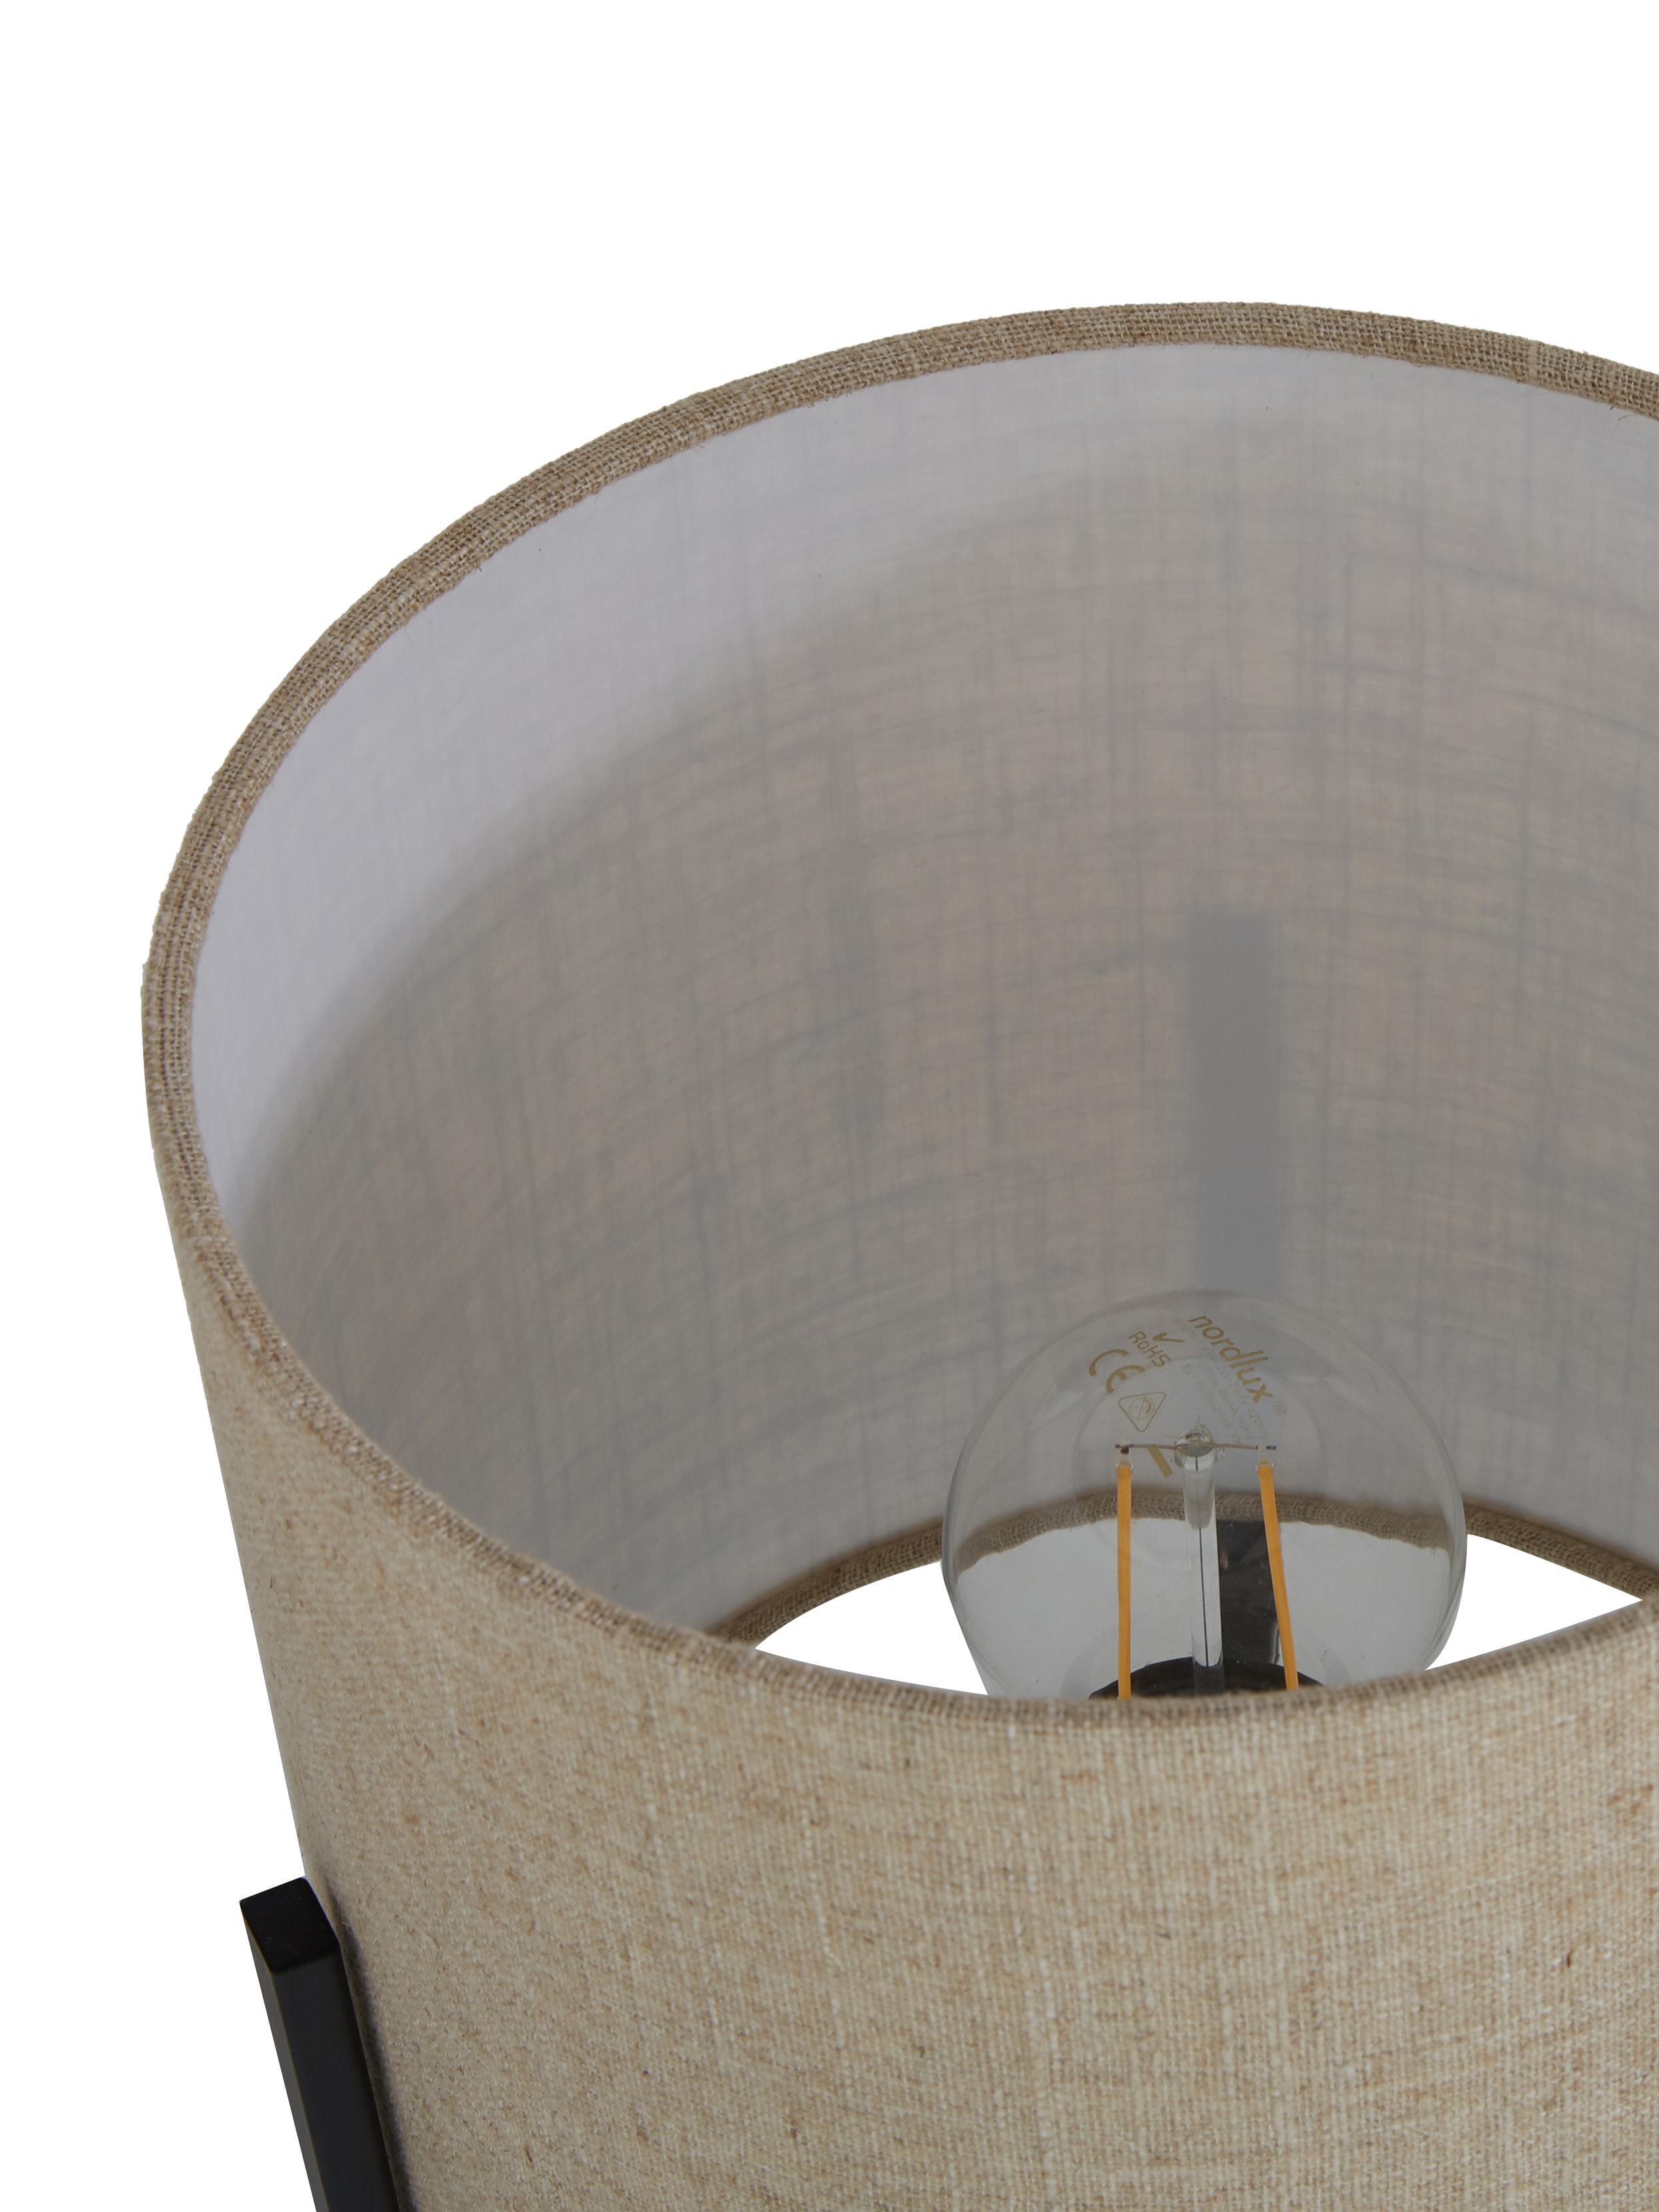 Tischlampe Piper aus Leinen, Lampenschirm: 85% Leinen, 15% Terylen, Lampenfuß: Metall, pulverbeschichtet, Beige, ∅ 22 x H 38 cm